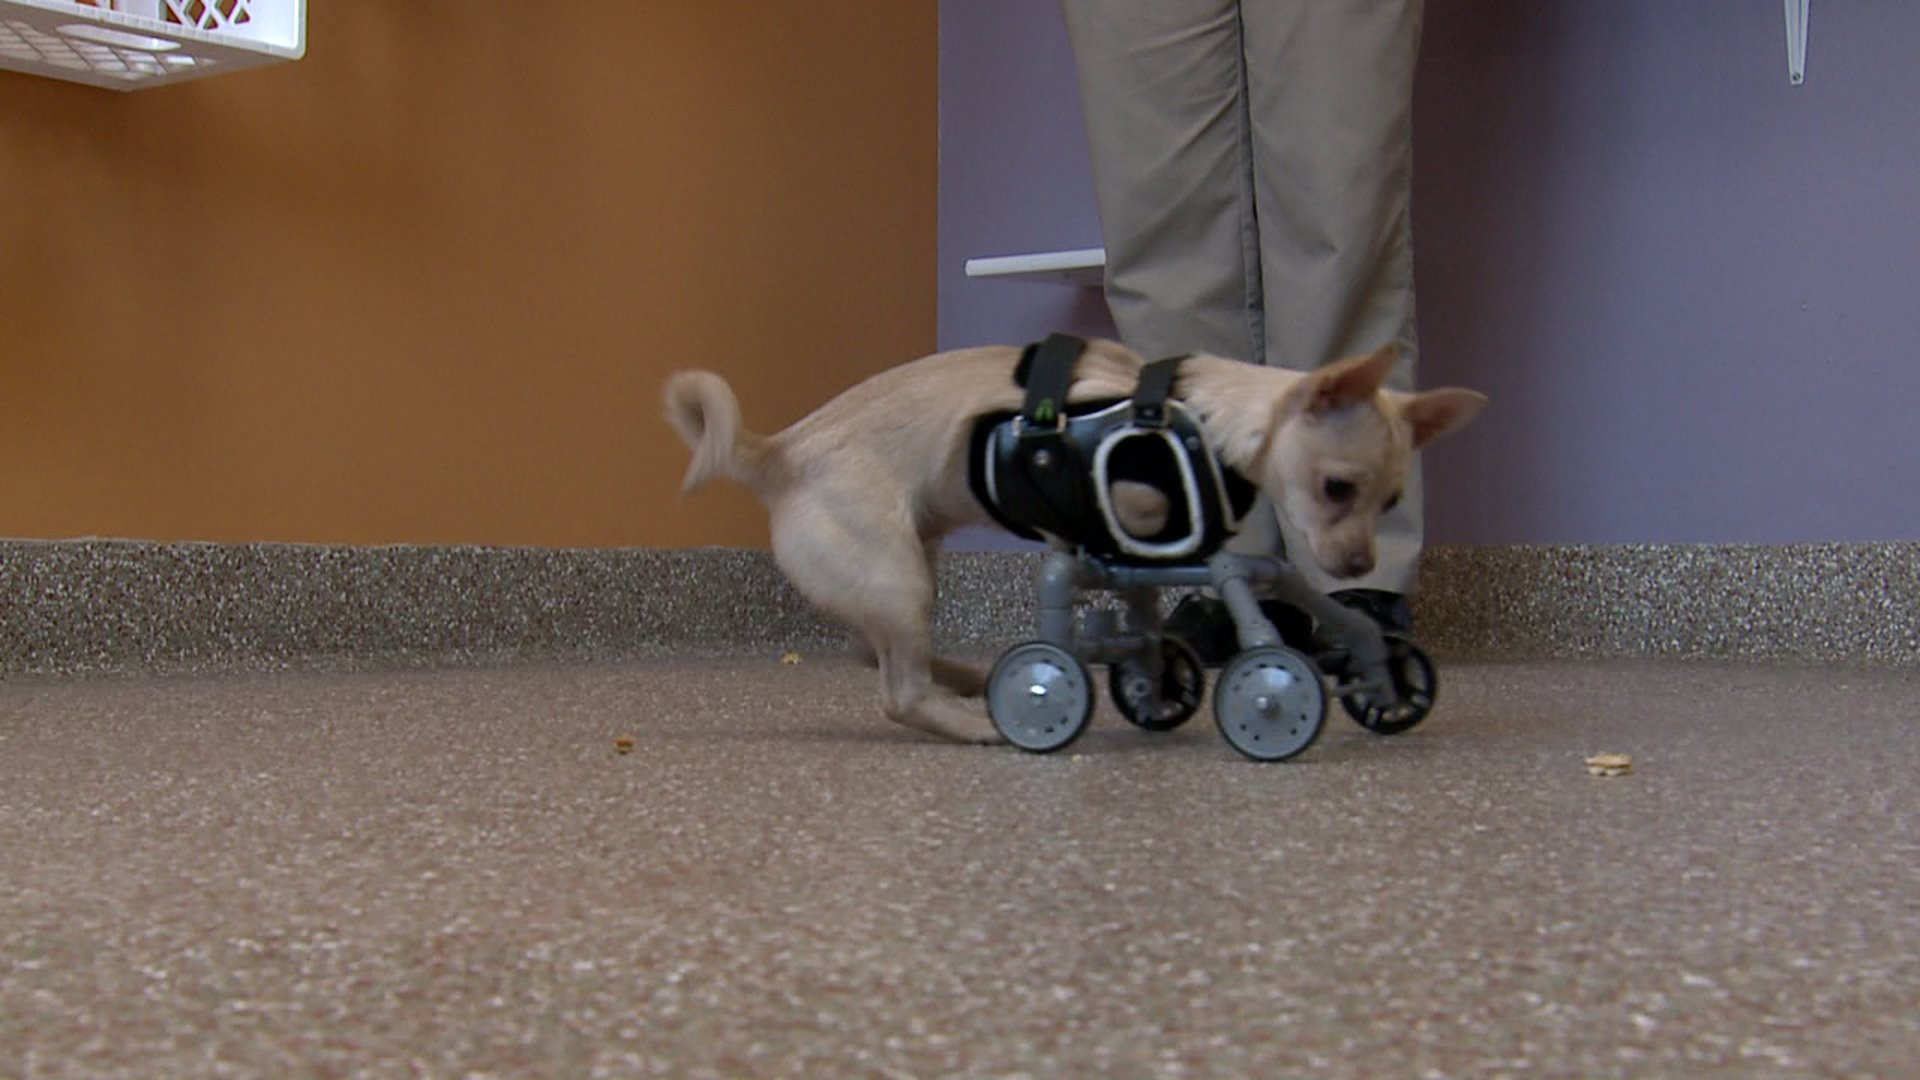 Boli frecvente Chihuahua: trebuie să știți proprietarul unui câine mic Boala articulației chihuahua